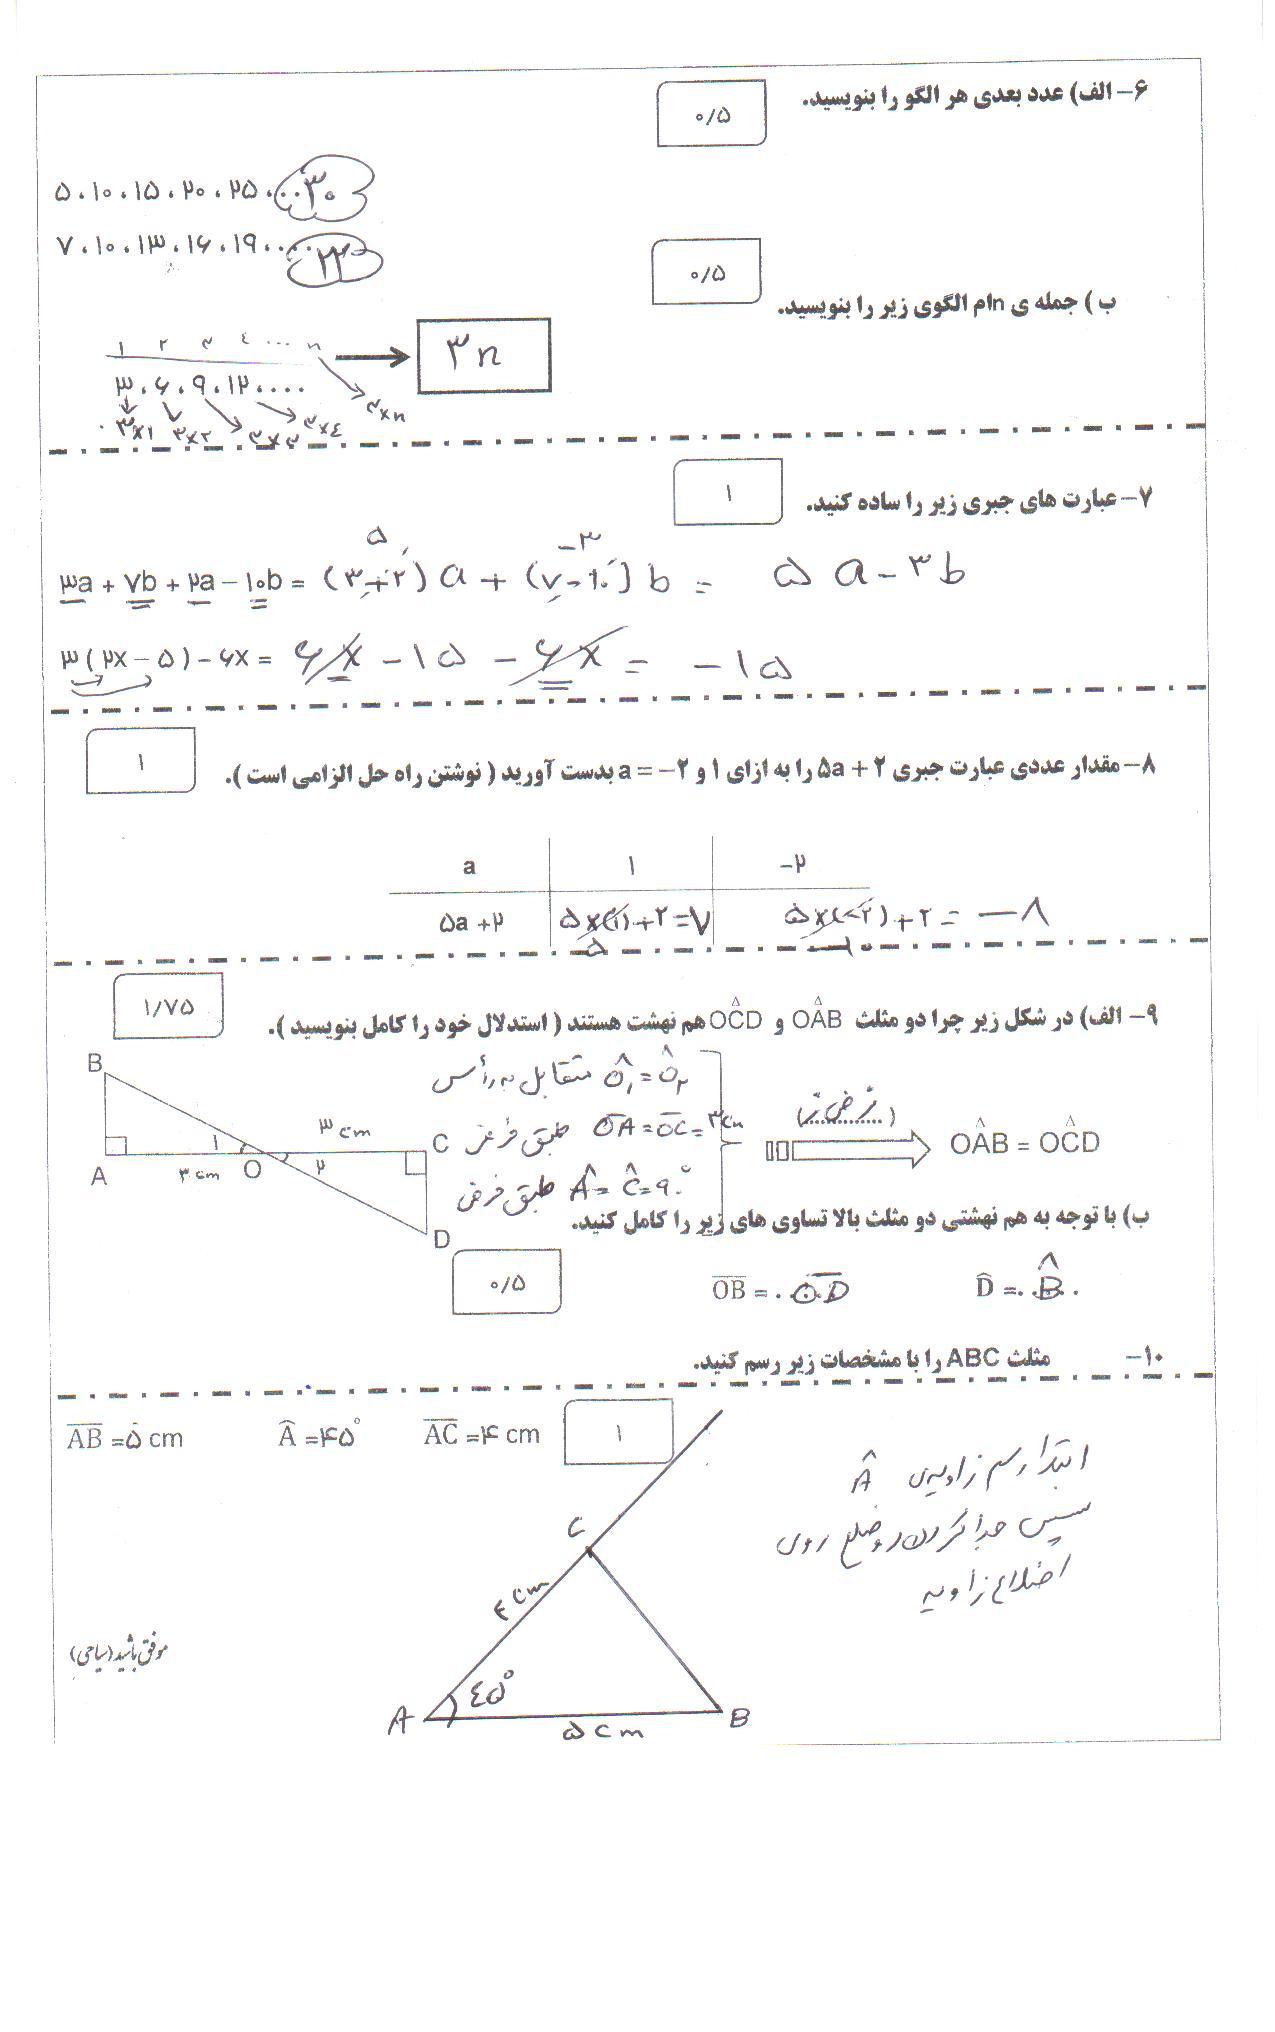 نمونه سوالات علوم ششم با جواب دانلود نمونه سوالات فارسی هشتم نوبت دوم - Bing images